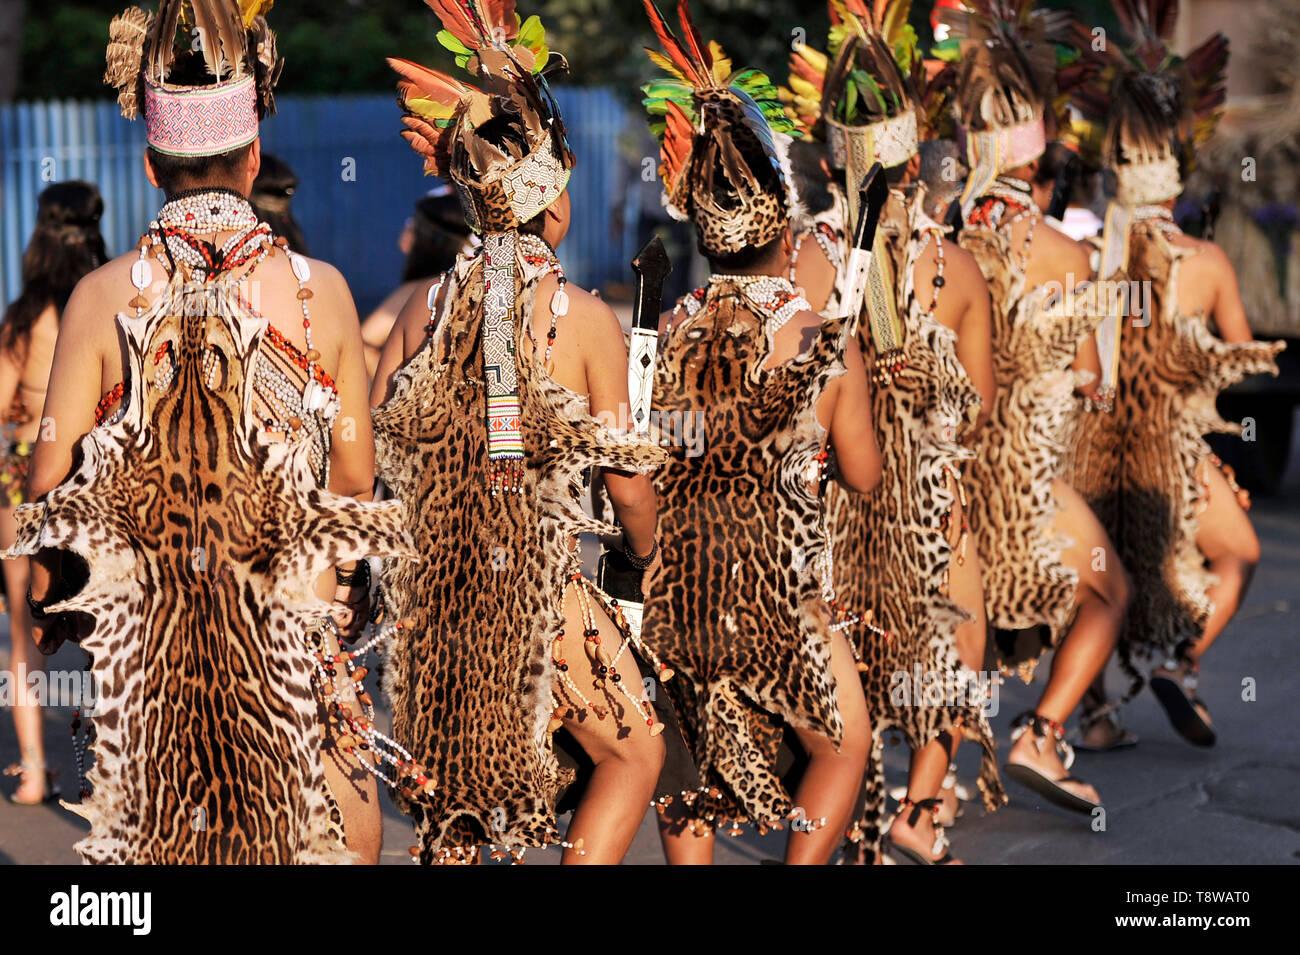 Men in traditional dress made of jaguar skin - Stock Image